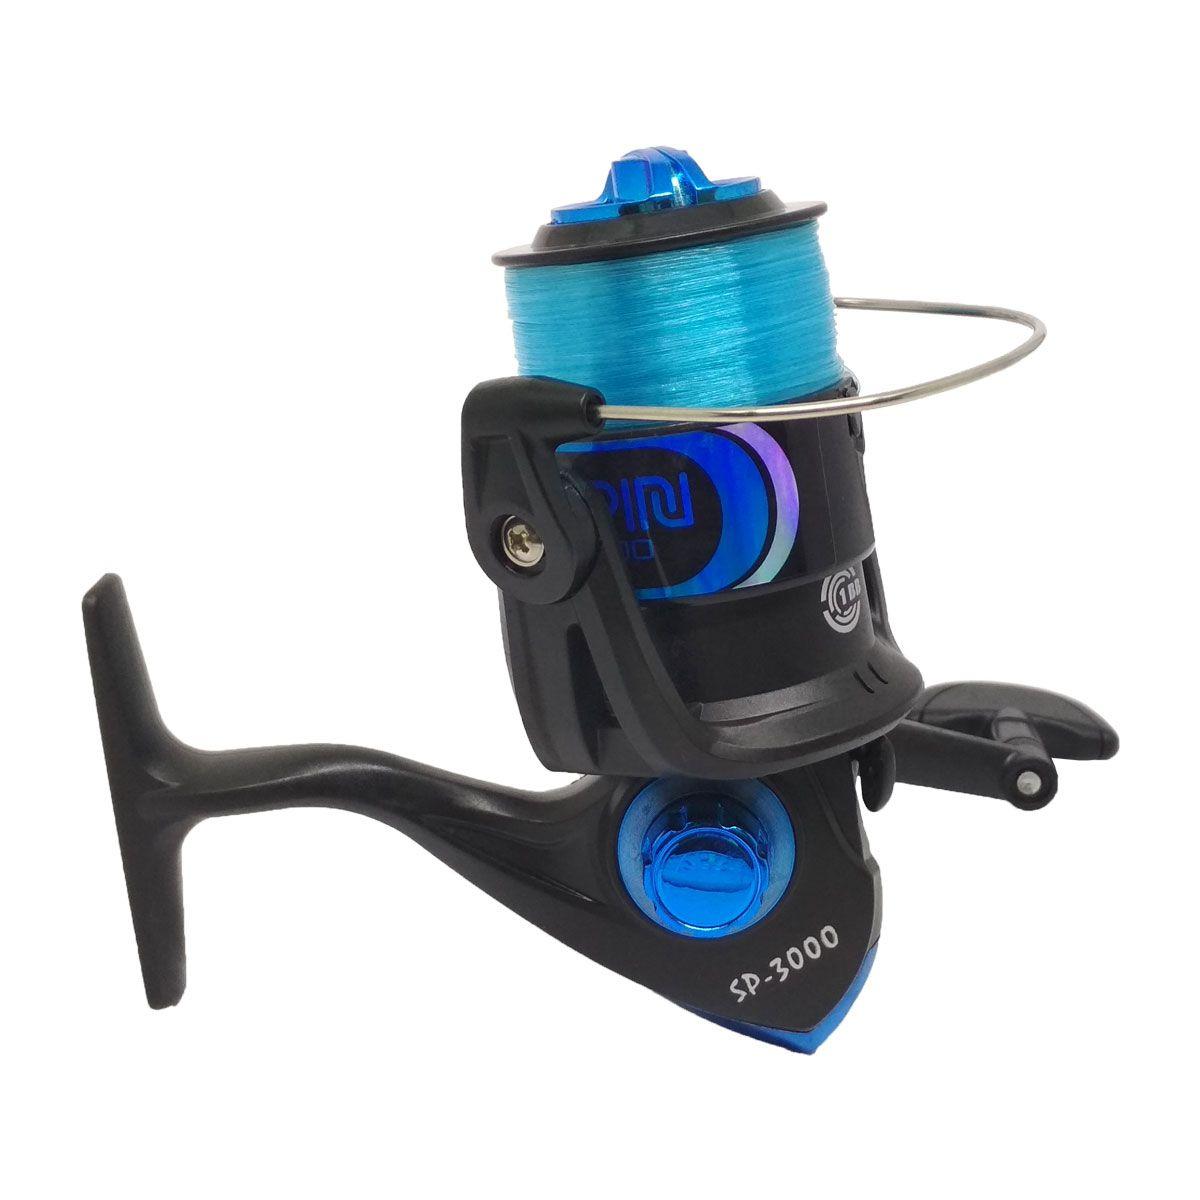 Molinete Plusfish Spin 3000 1 Rol 5.2:1 Azul